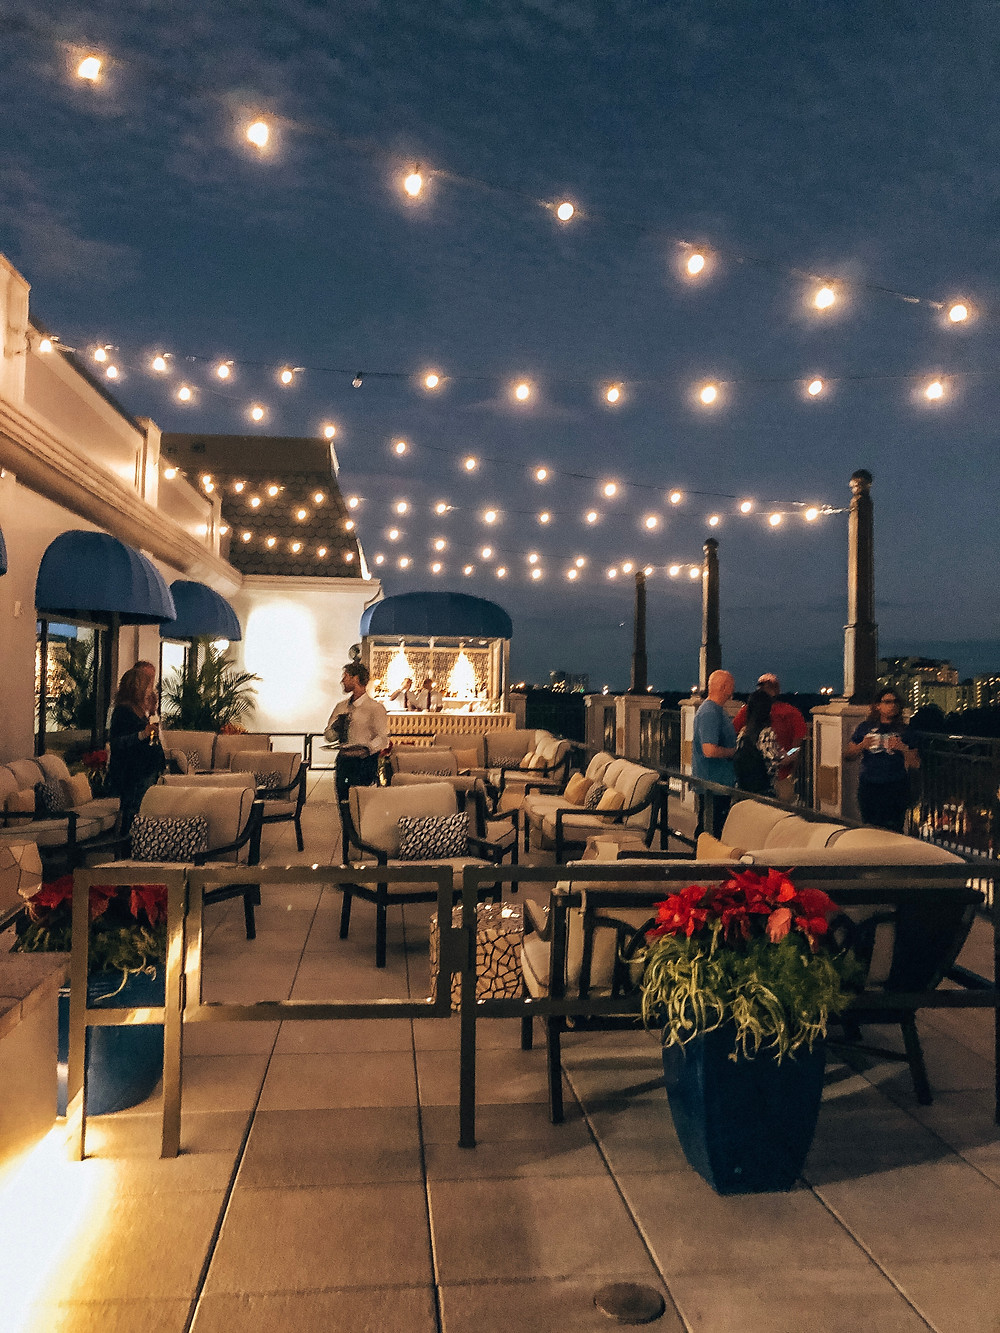 Outdoor bar at Topolino's Terrace at Disney's Riviera Resort